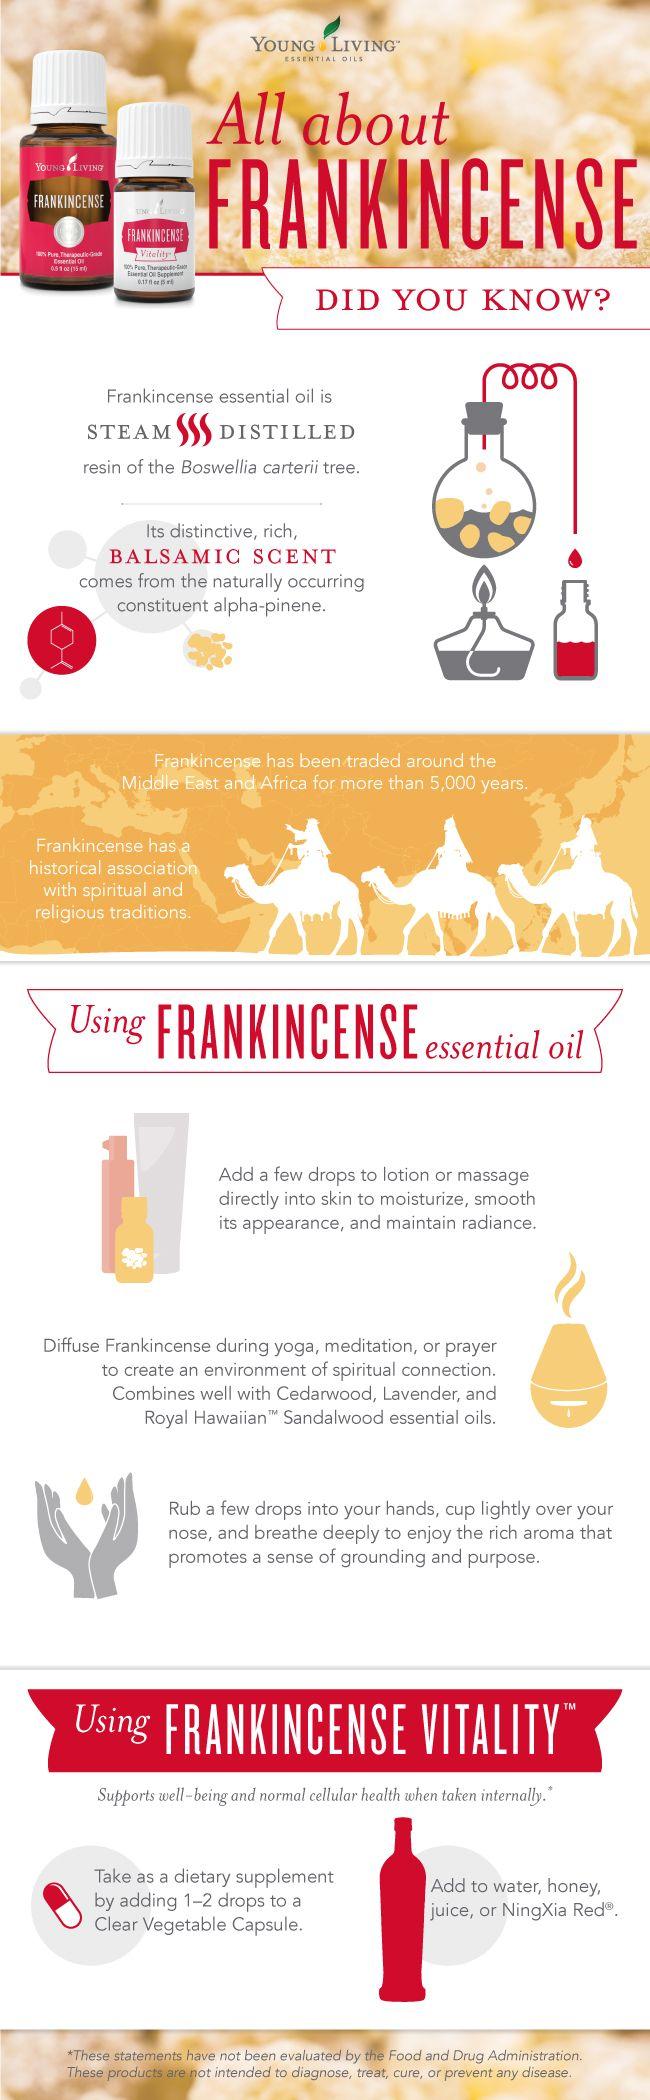 Blog-Frankincense_Infographic_US_0816_sk                                                                                                                                                                                 More